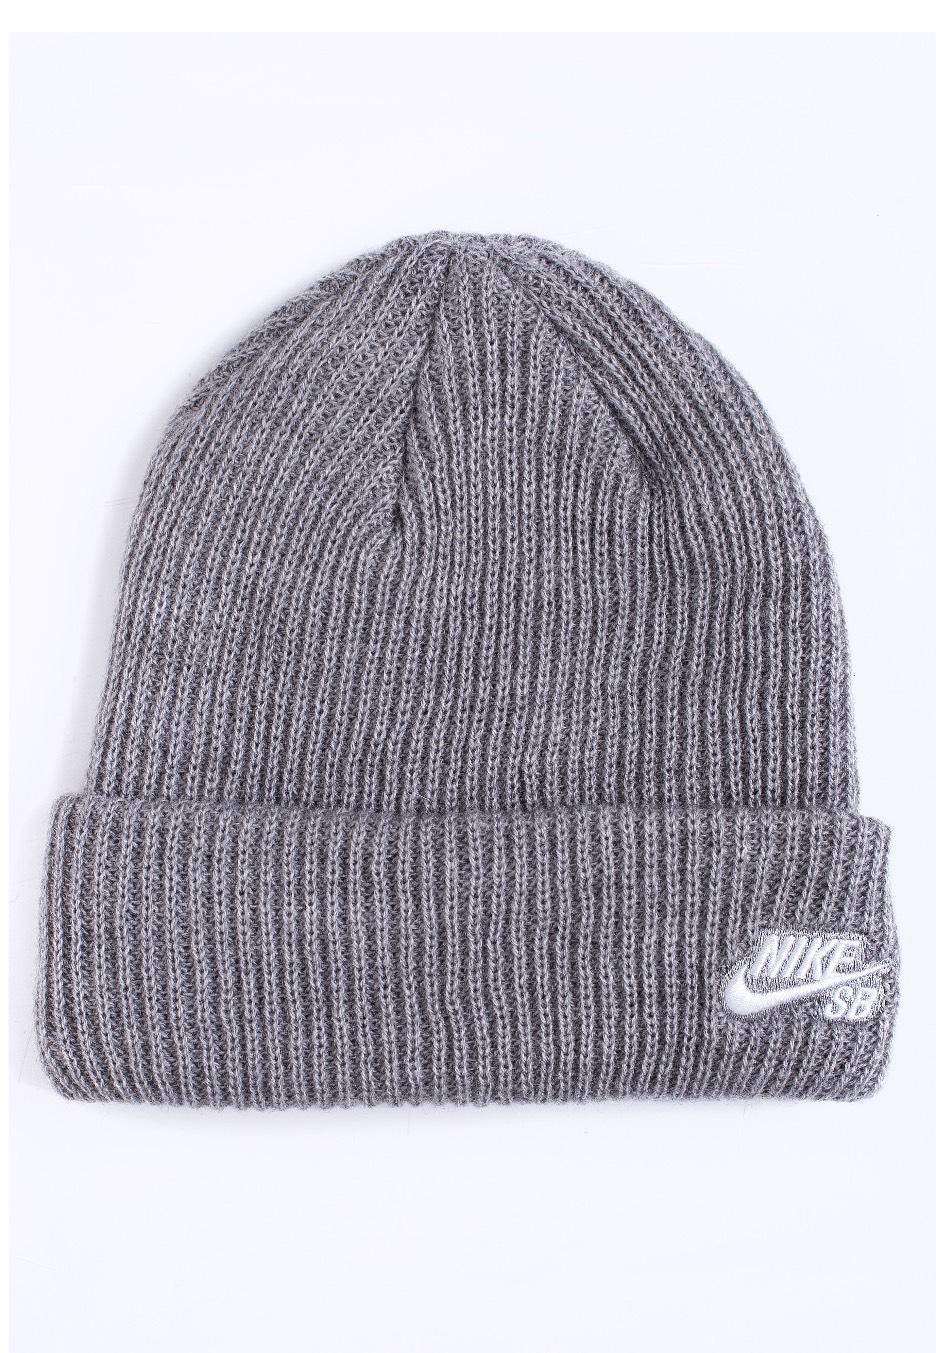 9932a44feaa Nike - SB Fisherman Dark Grey Heather White - Beanie - Streetwear Shop -  Impericon.com UK